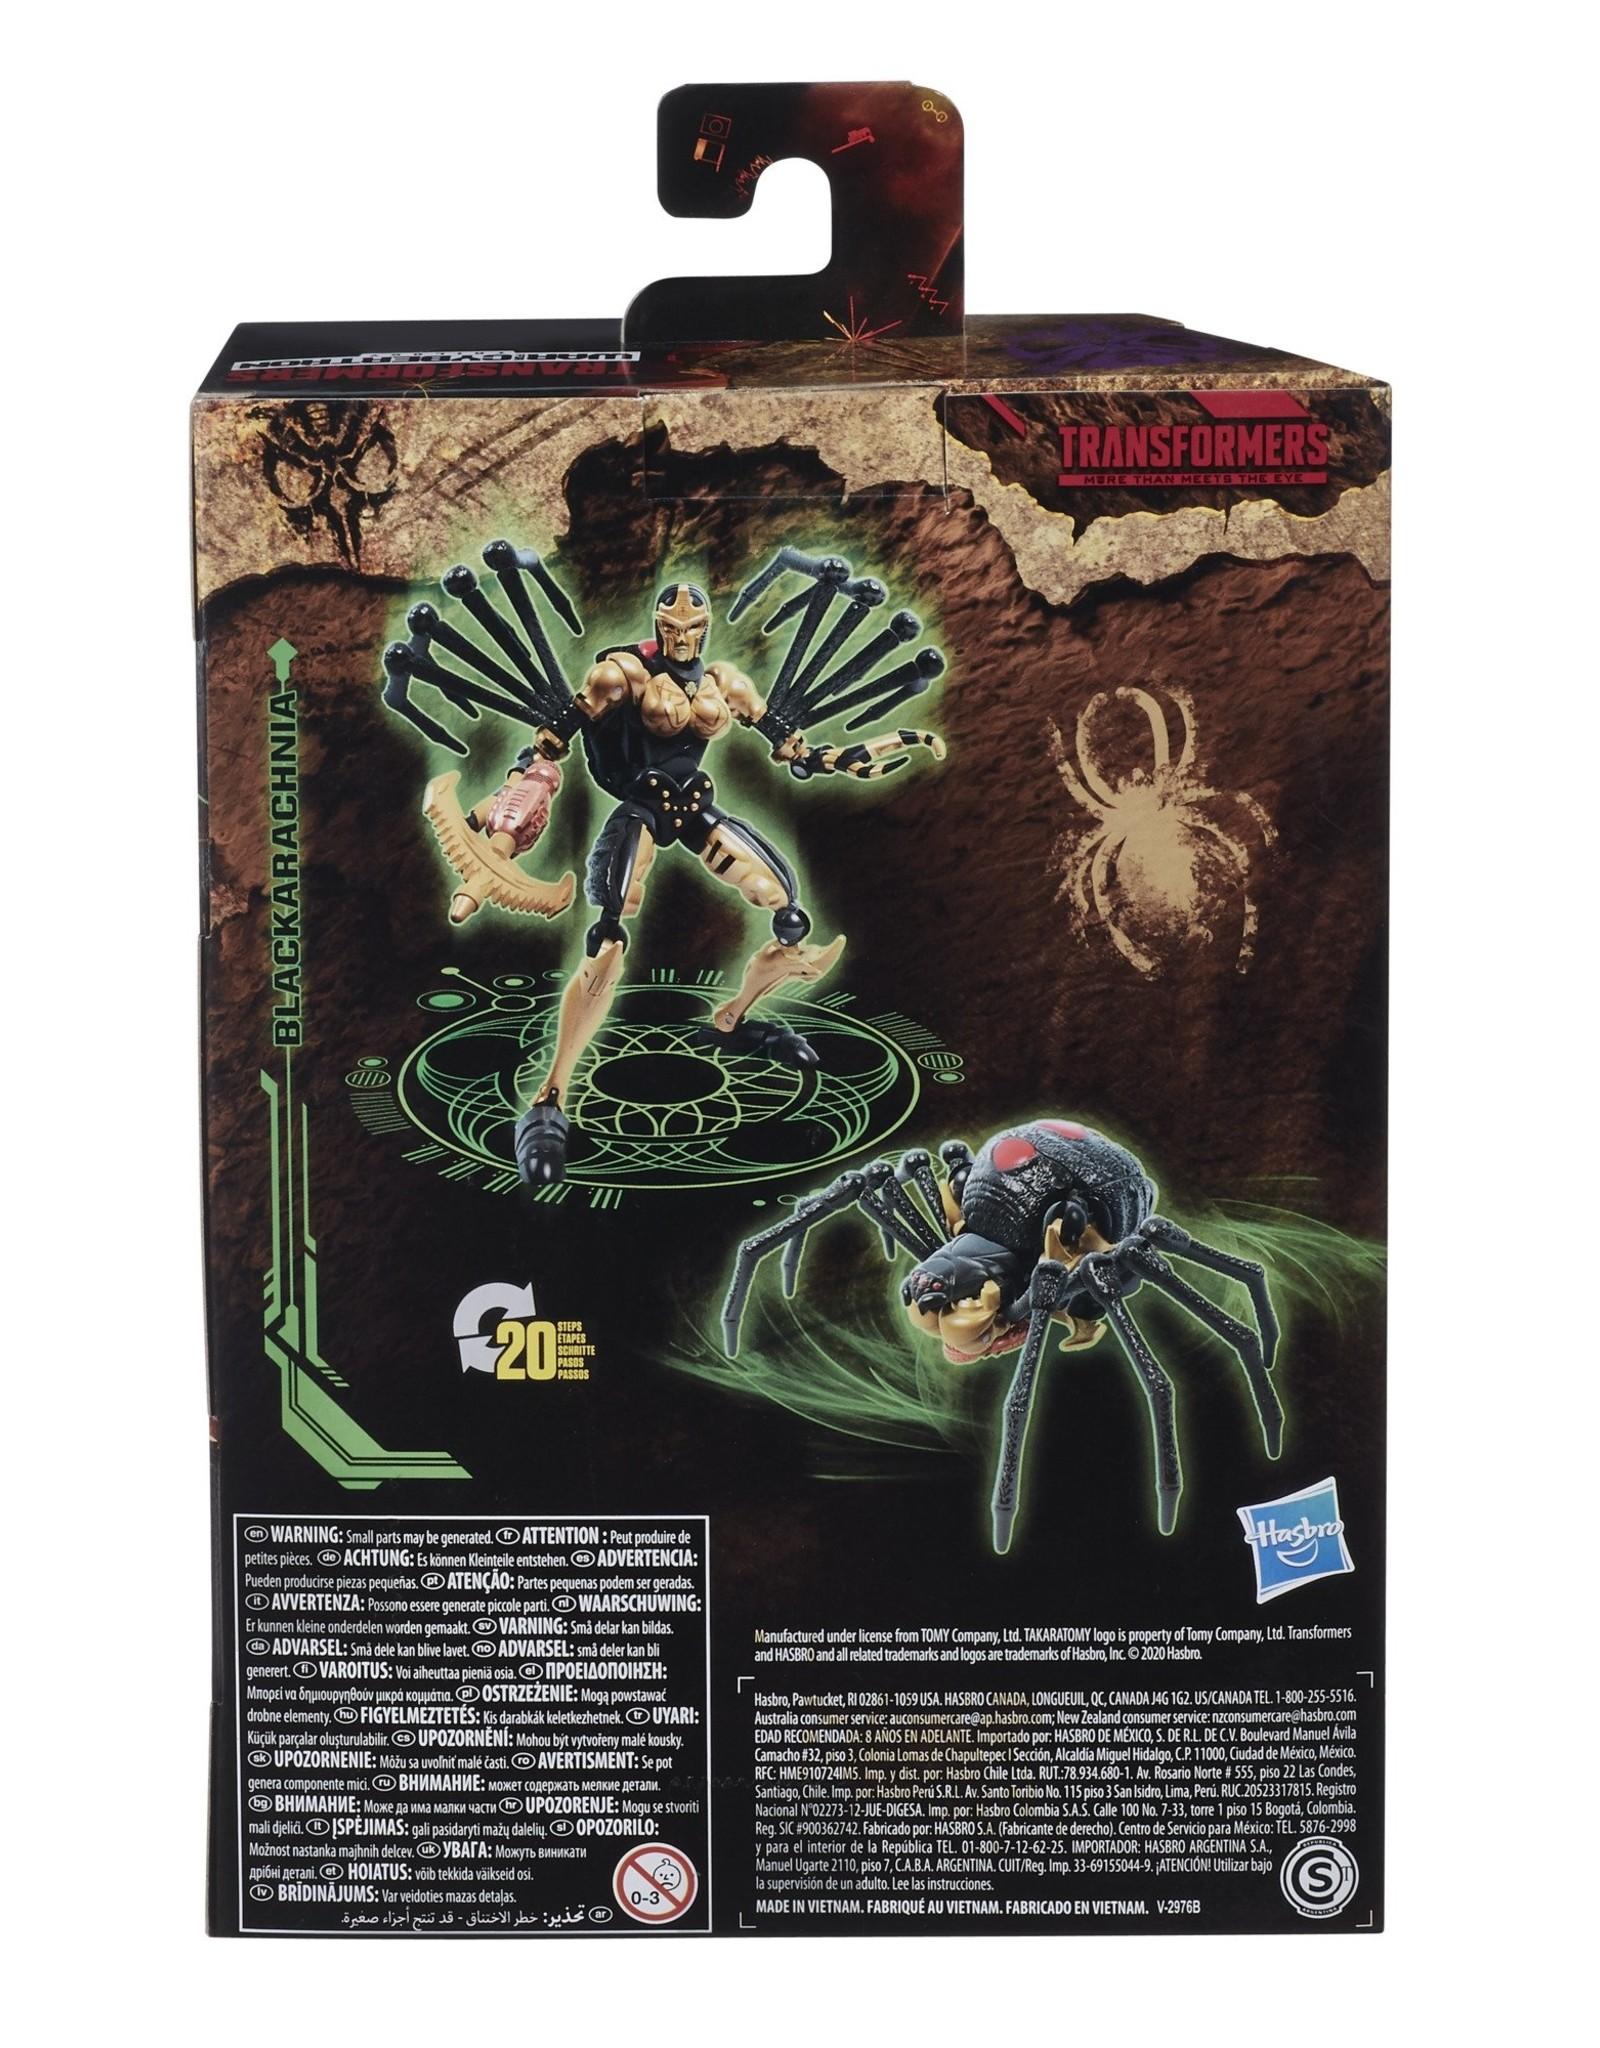 HASBRO Transformers Generations War for Cybertron: Kingdom Deluxe WFC-K5 Blackarachnia